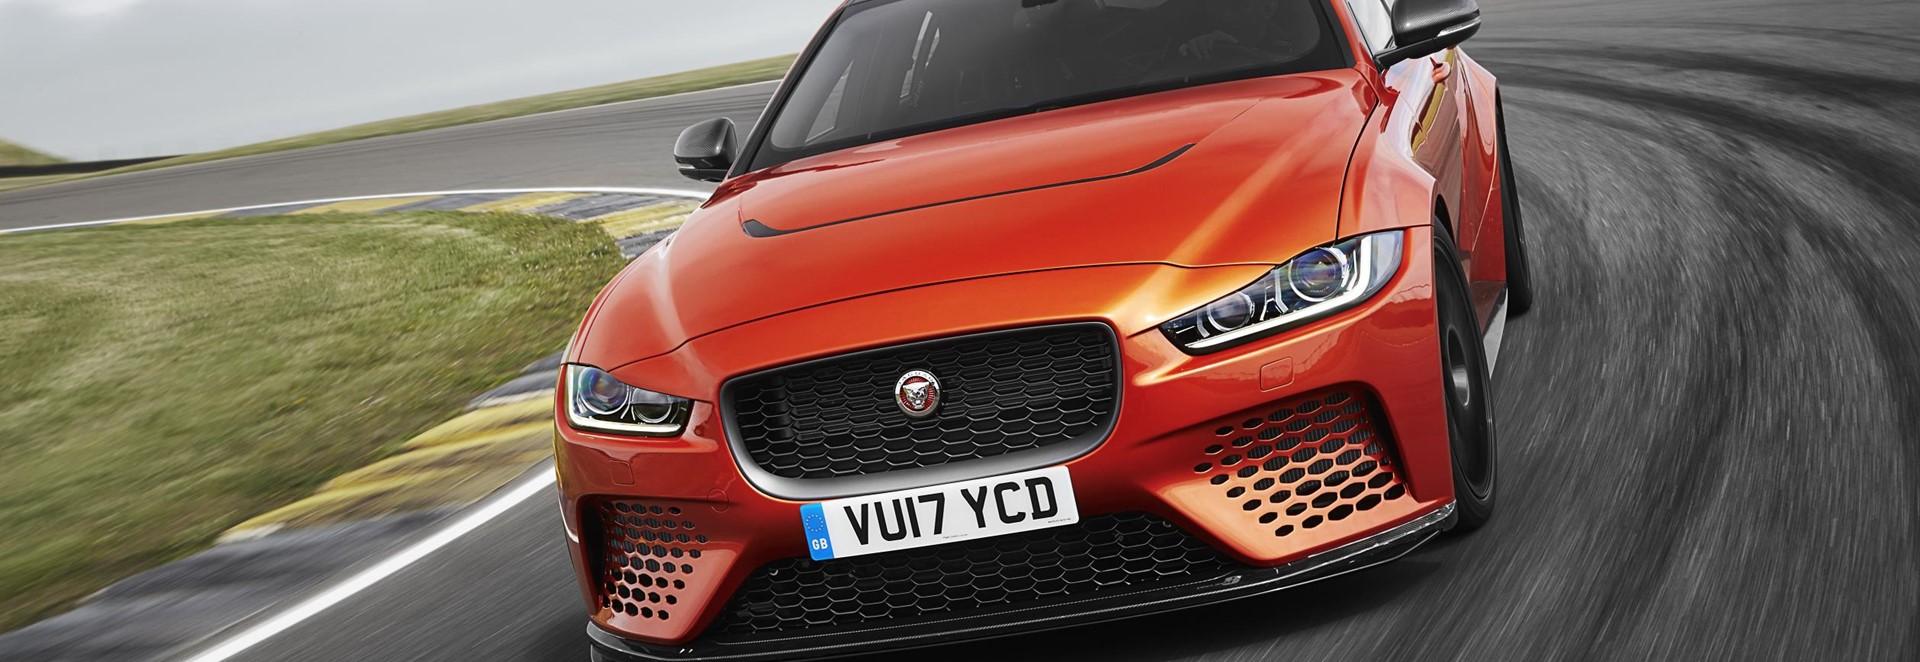 jaguar xe sv project 8 pricing confirmed car keys